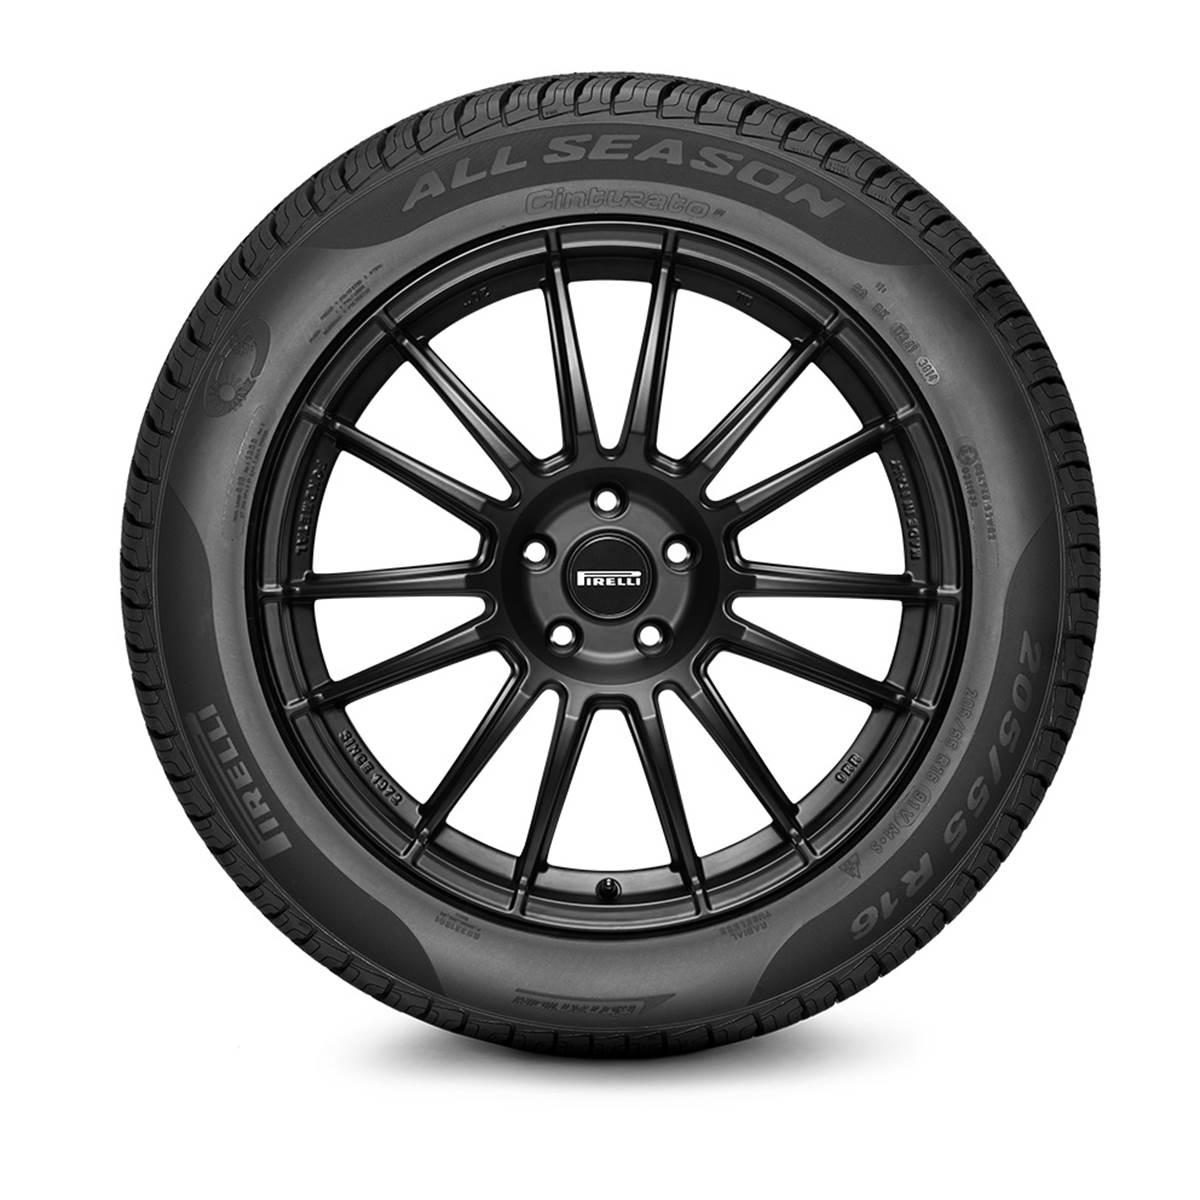 Pneu 4 Saisons Pirelli 225/45R17 94W Cinturato All Season +